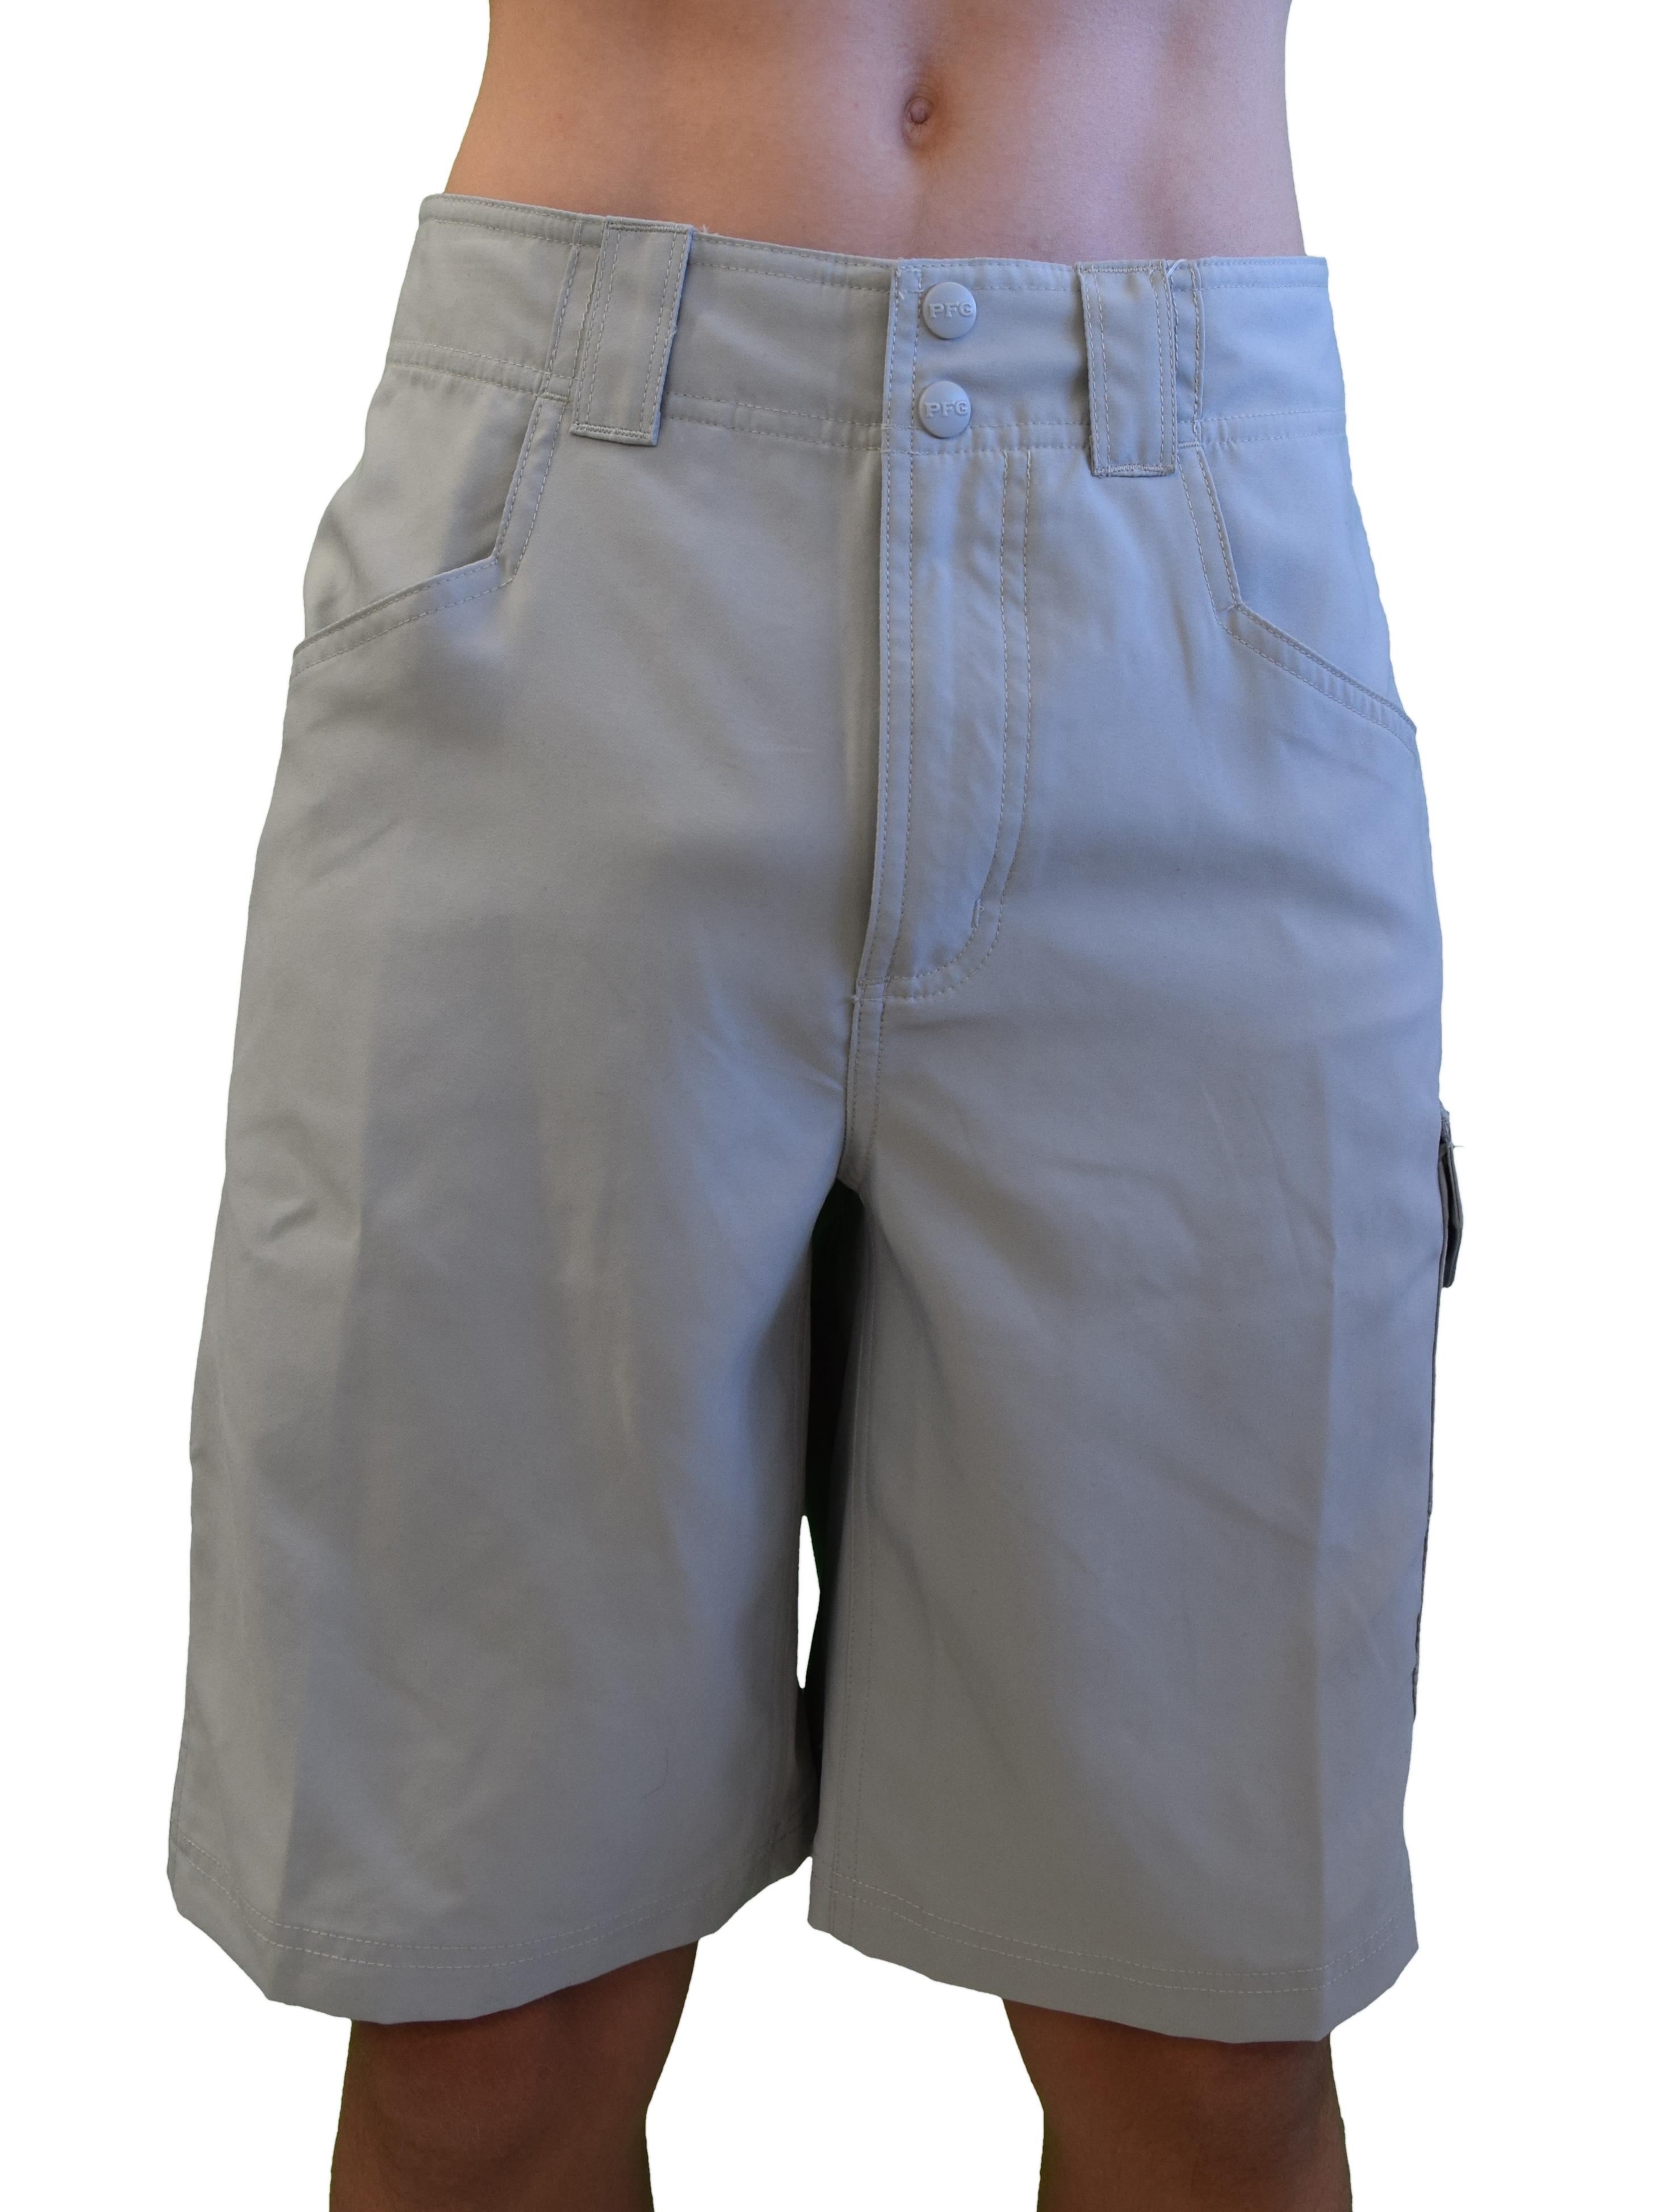 87a205dd1064 Pfg Men s Shorts Related Keywords   Suggestions - Pfg Men s Shorts ...